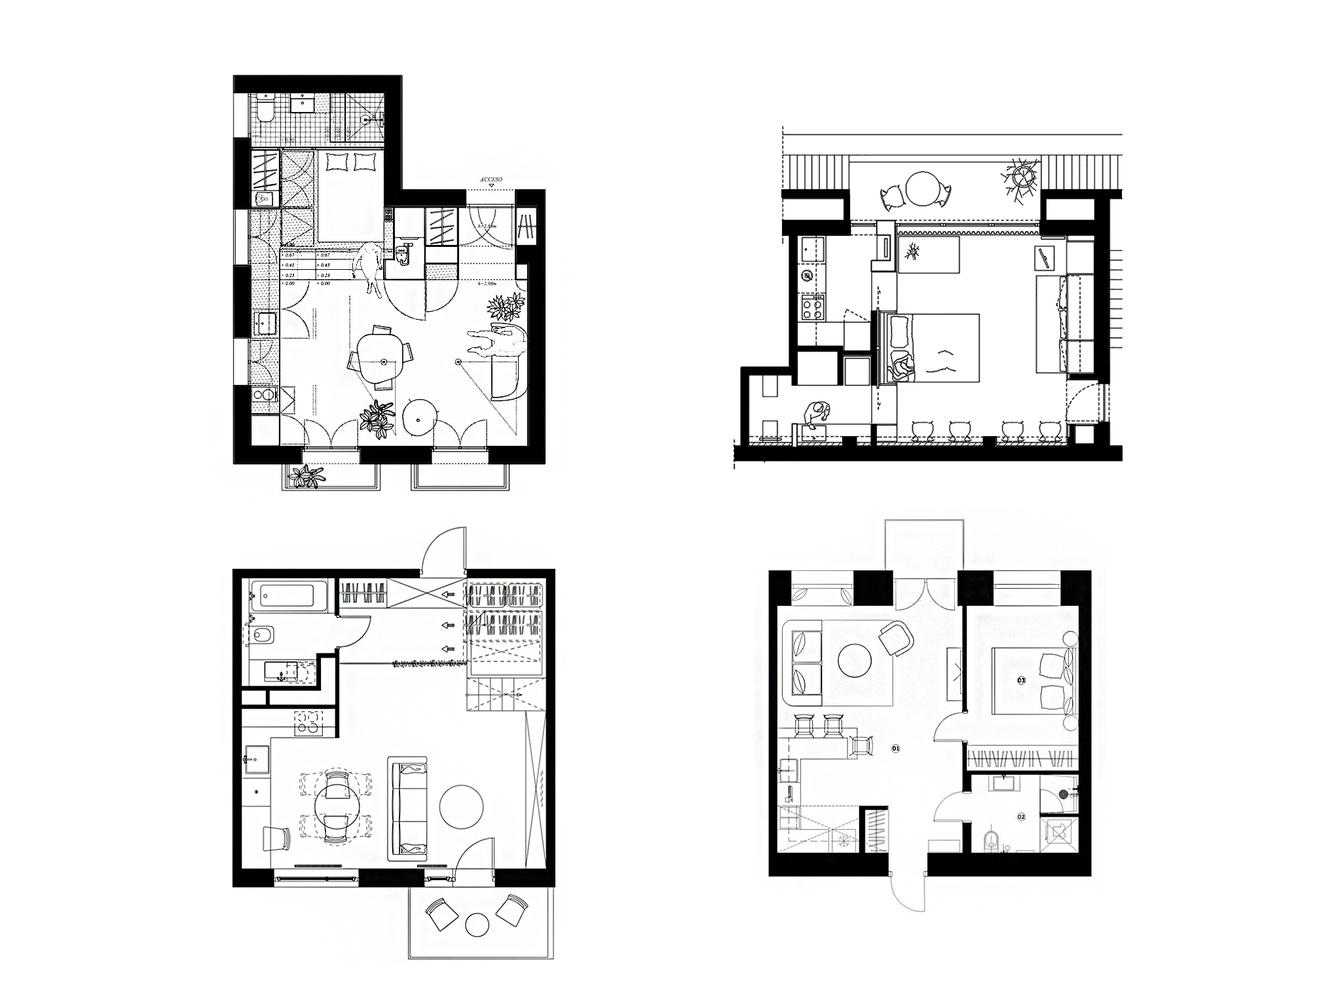 26 پلان آپارتمان کوچک با مساحت 20 تا 50 متر مربع - House Plans Under 50 Meters 1 1